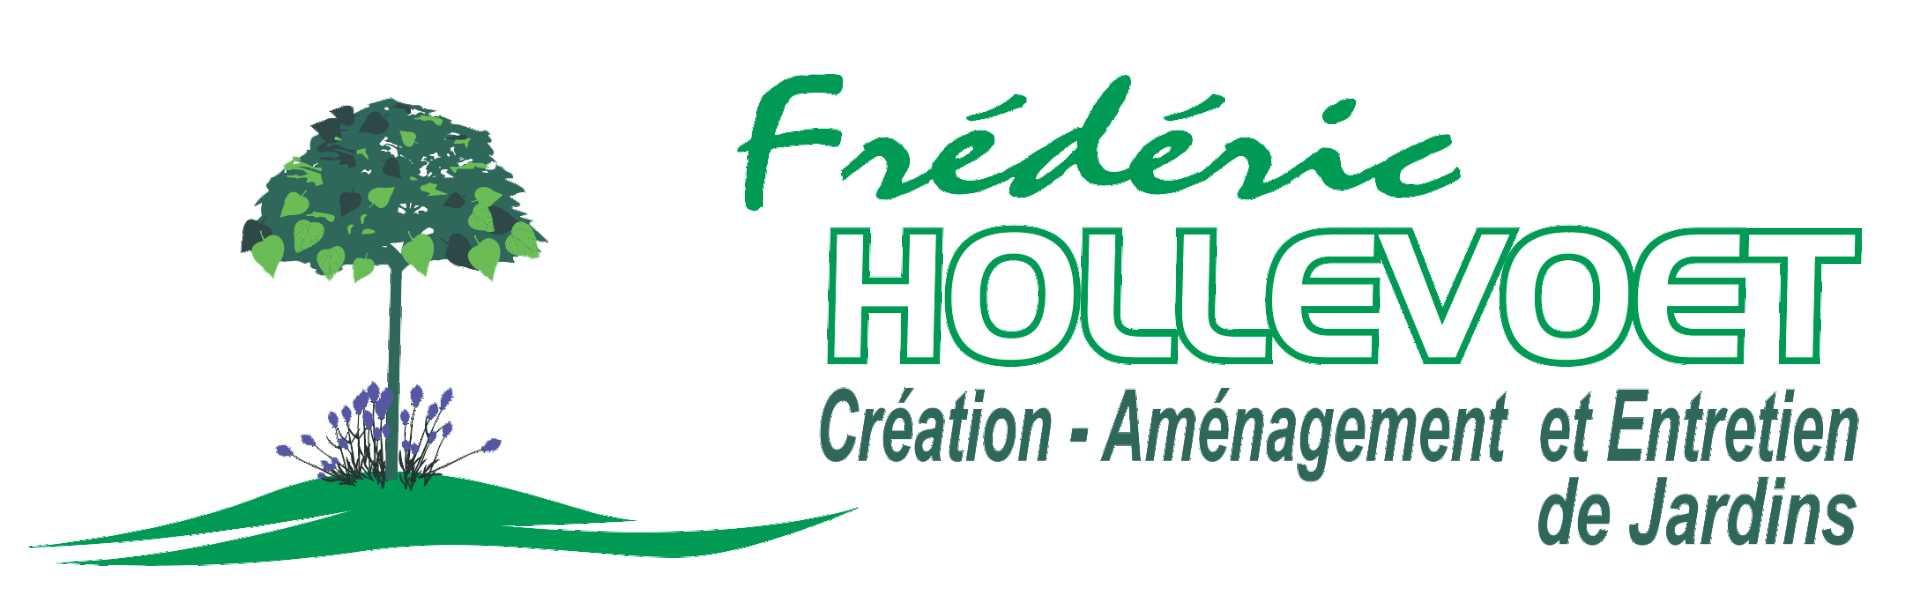 Frédéric Hollevoet